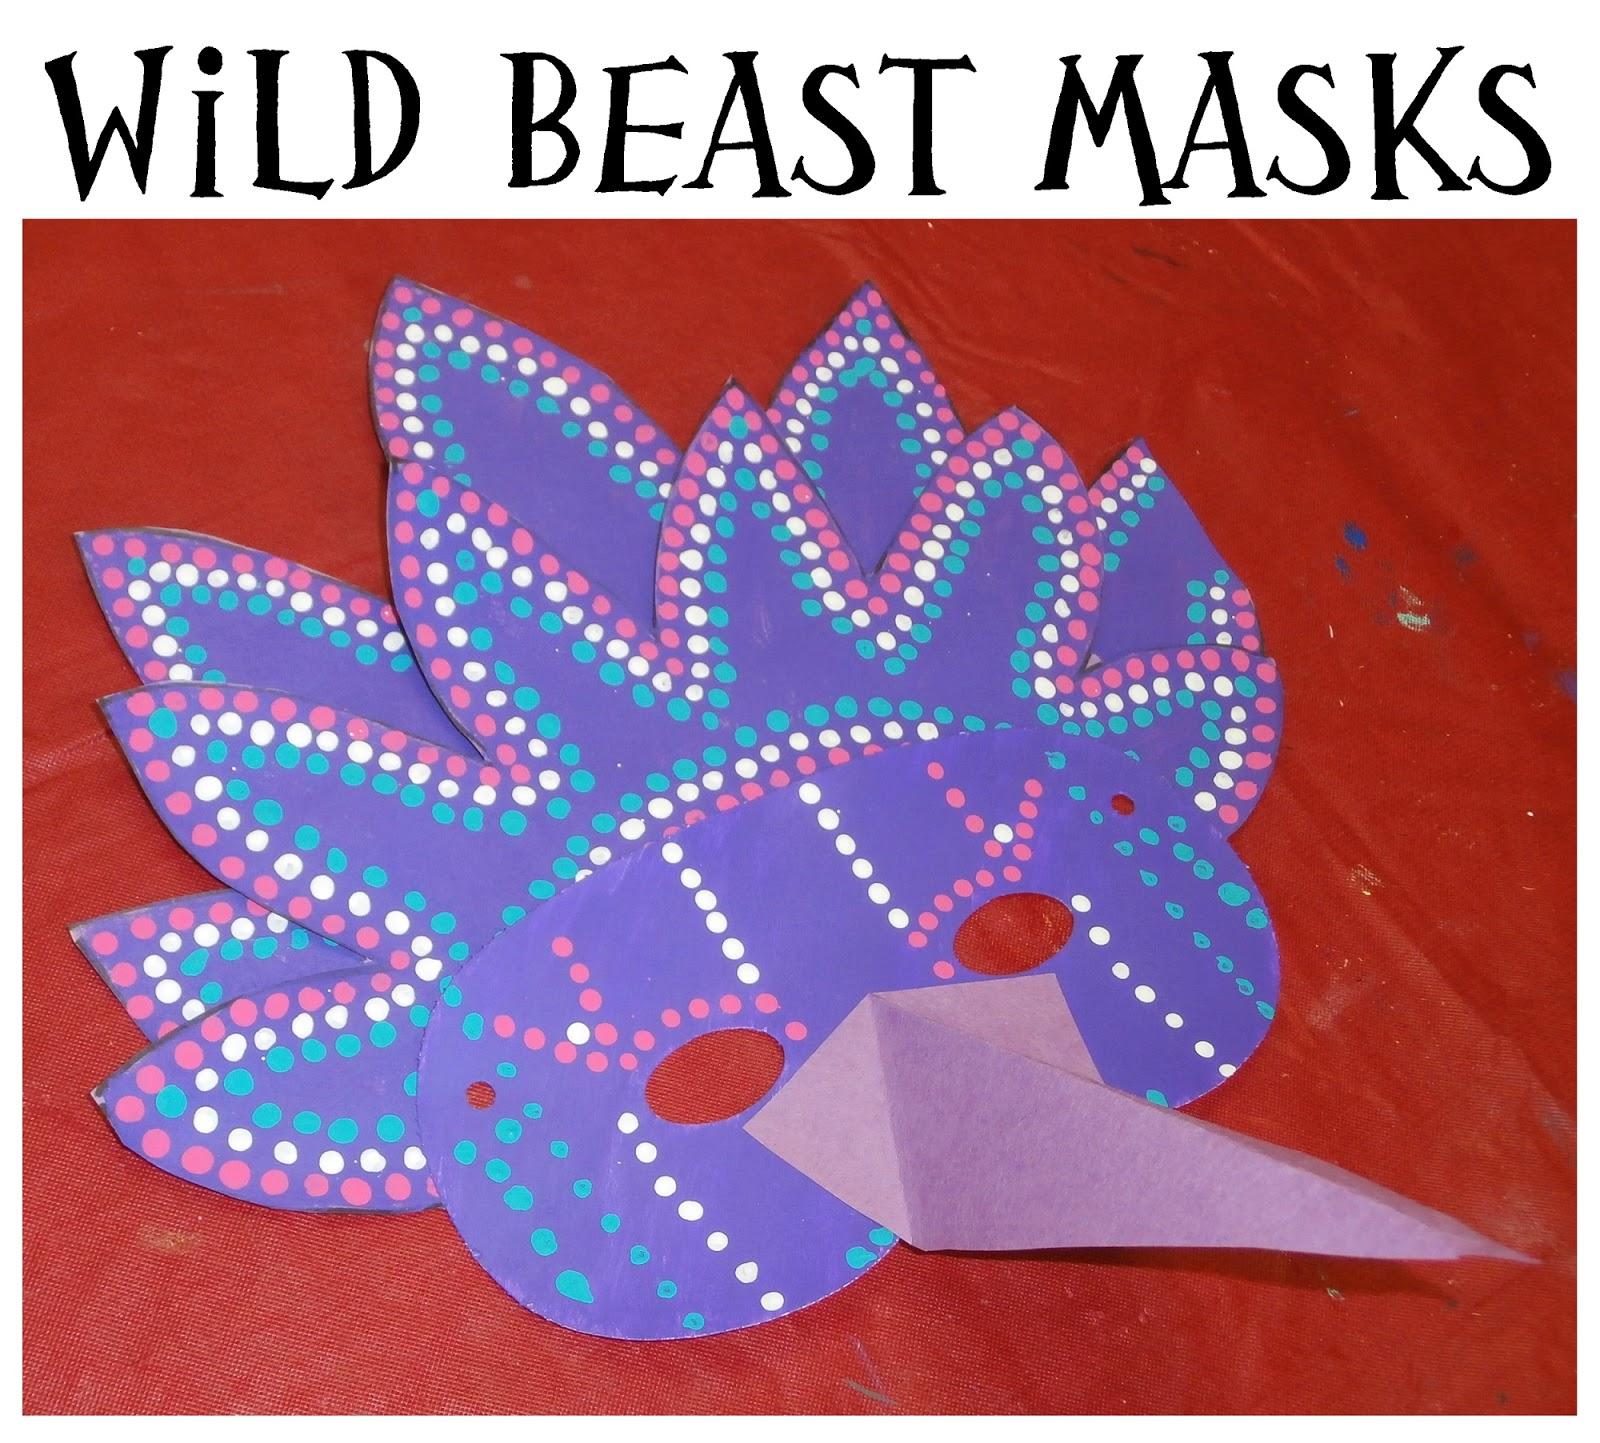 http://www.artintertwine.blogspot.ca/2015/04/wild-beast-masks.html